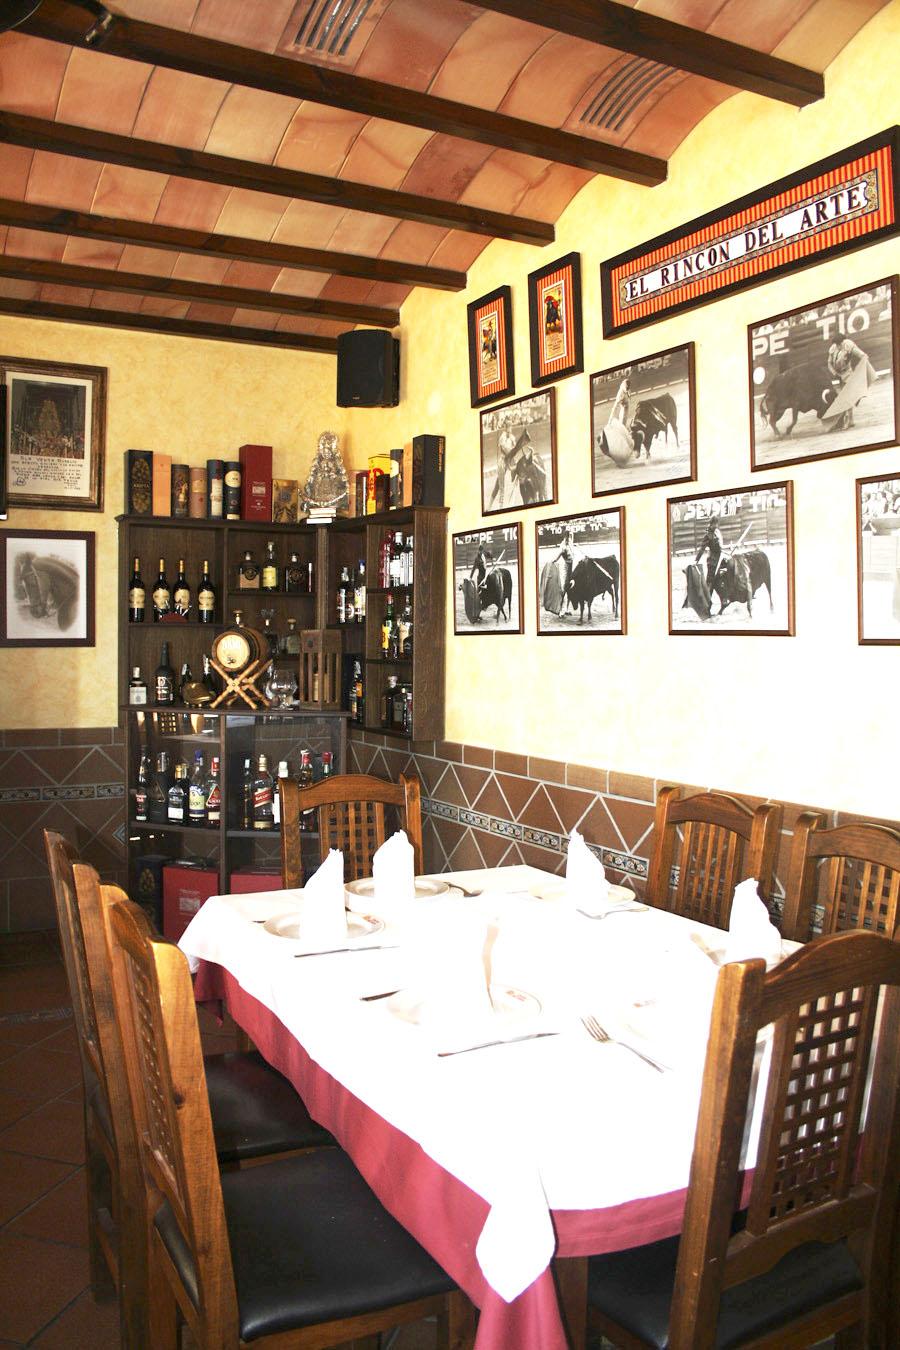 File:Comedor-taurino-restaurante-chipiona-venta-aurelio.JPG ...